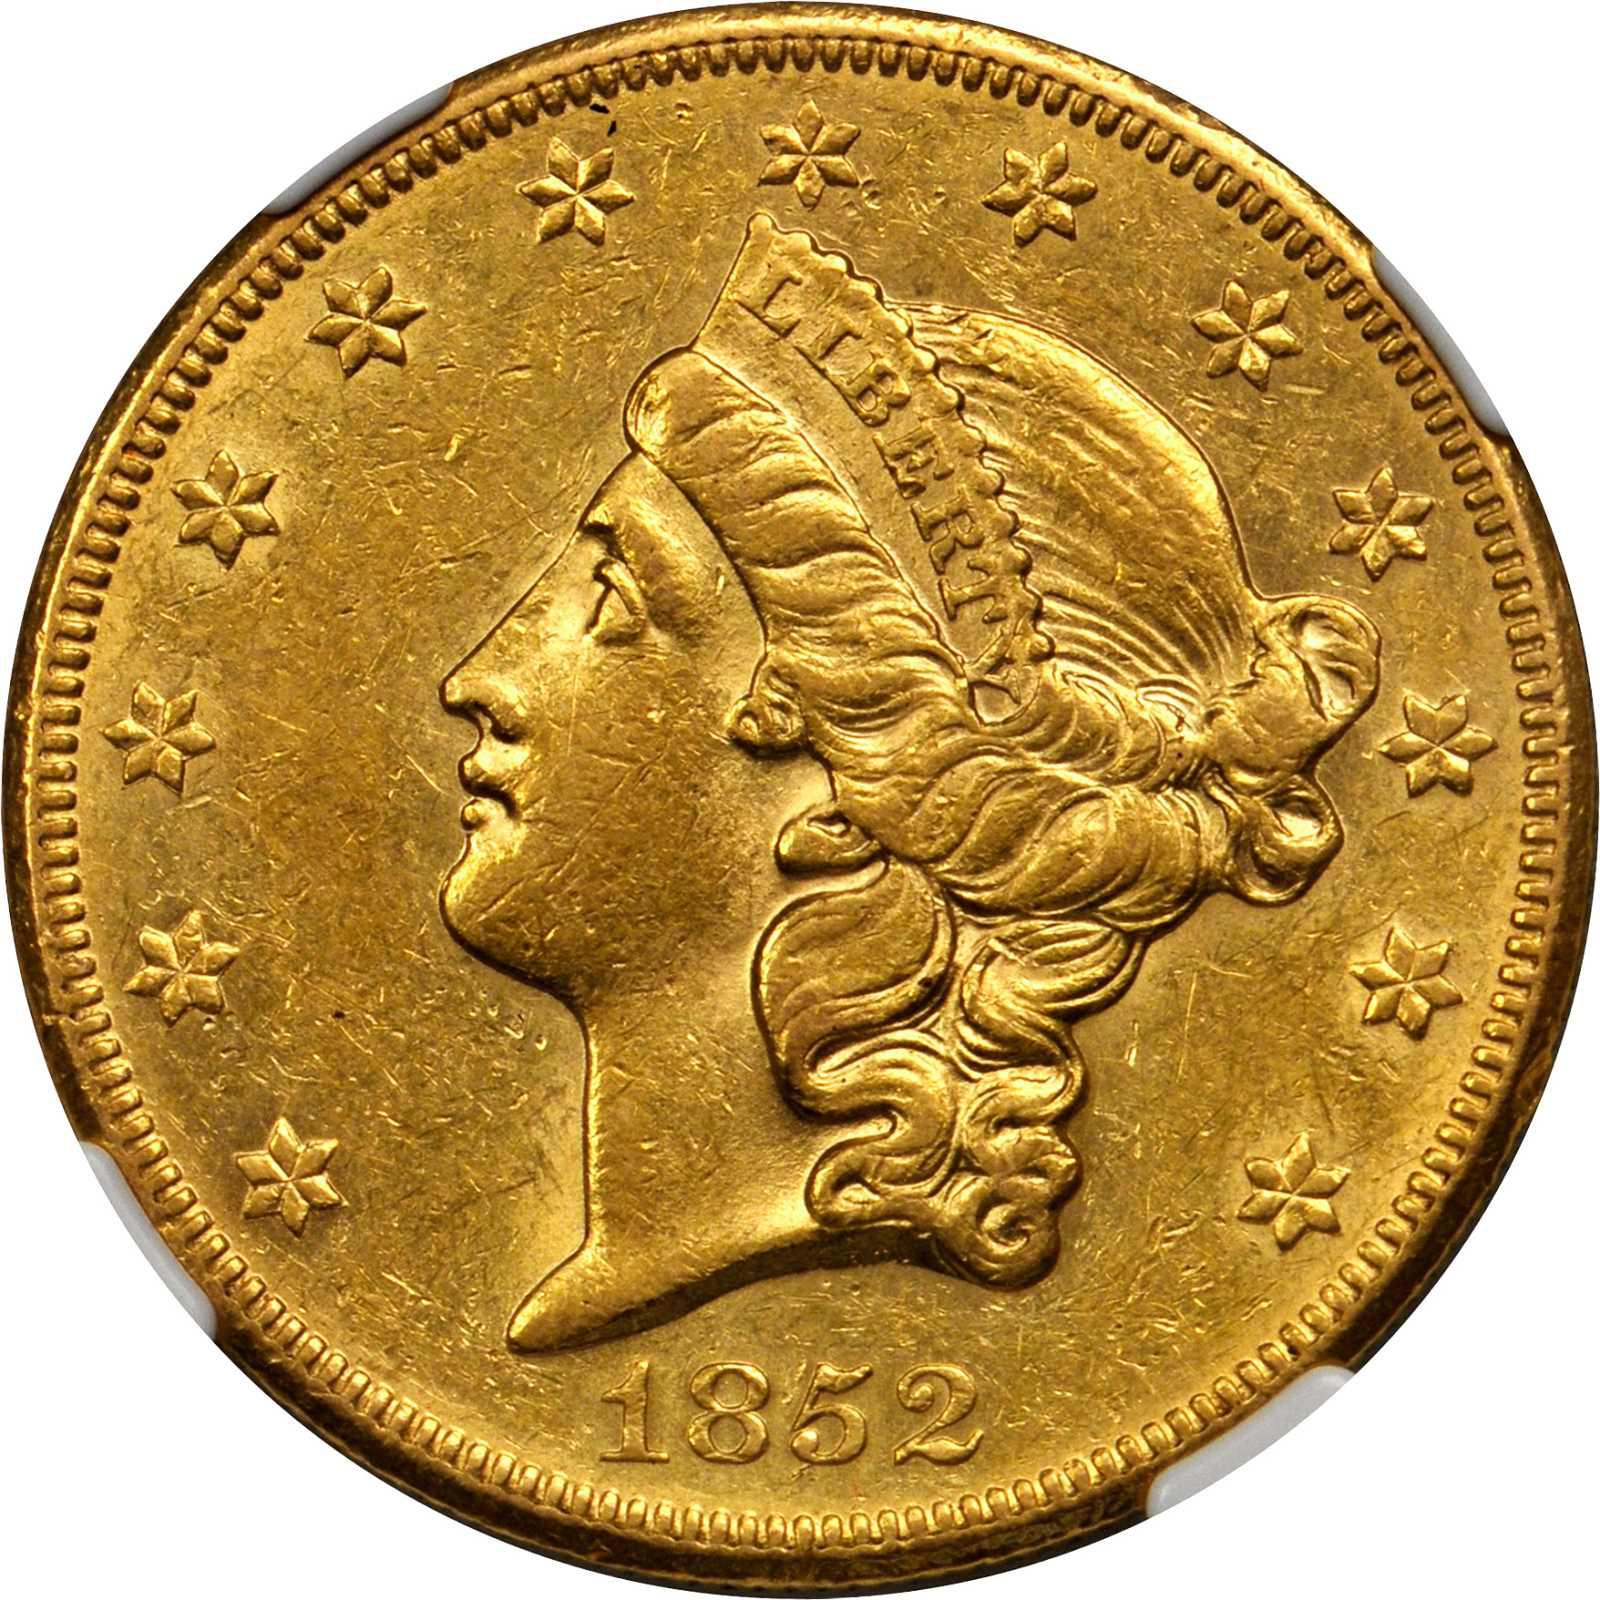 Value Of 1852 O 20 Liberty Double Eagle Sell Rare Coins